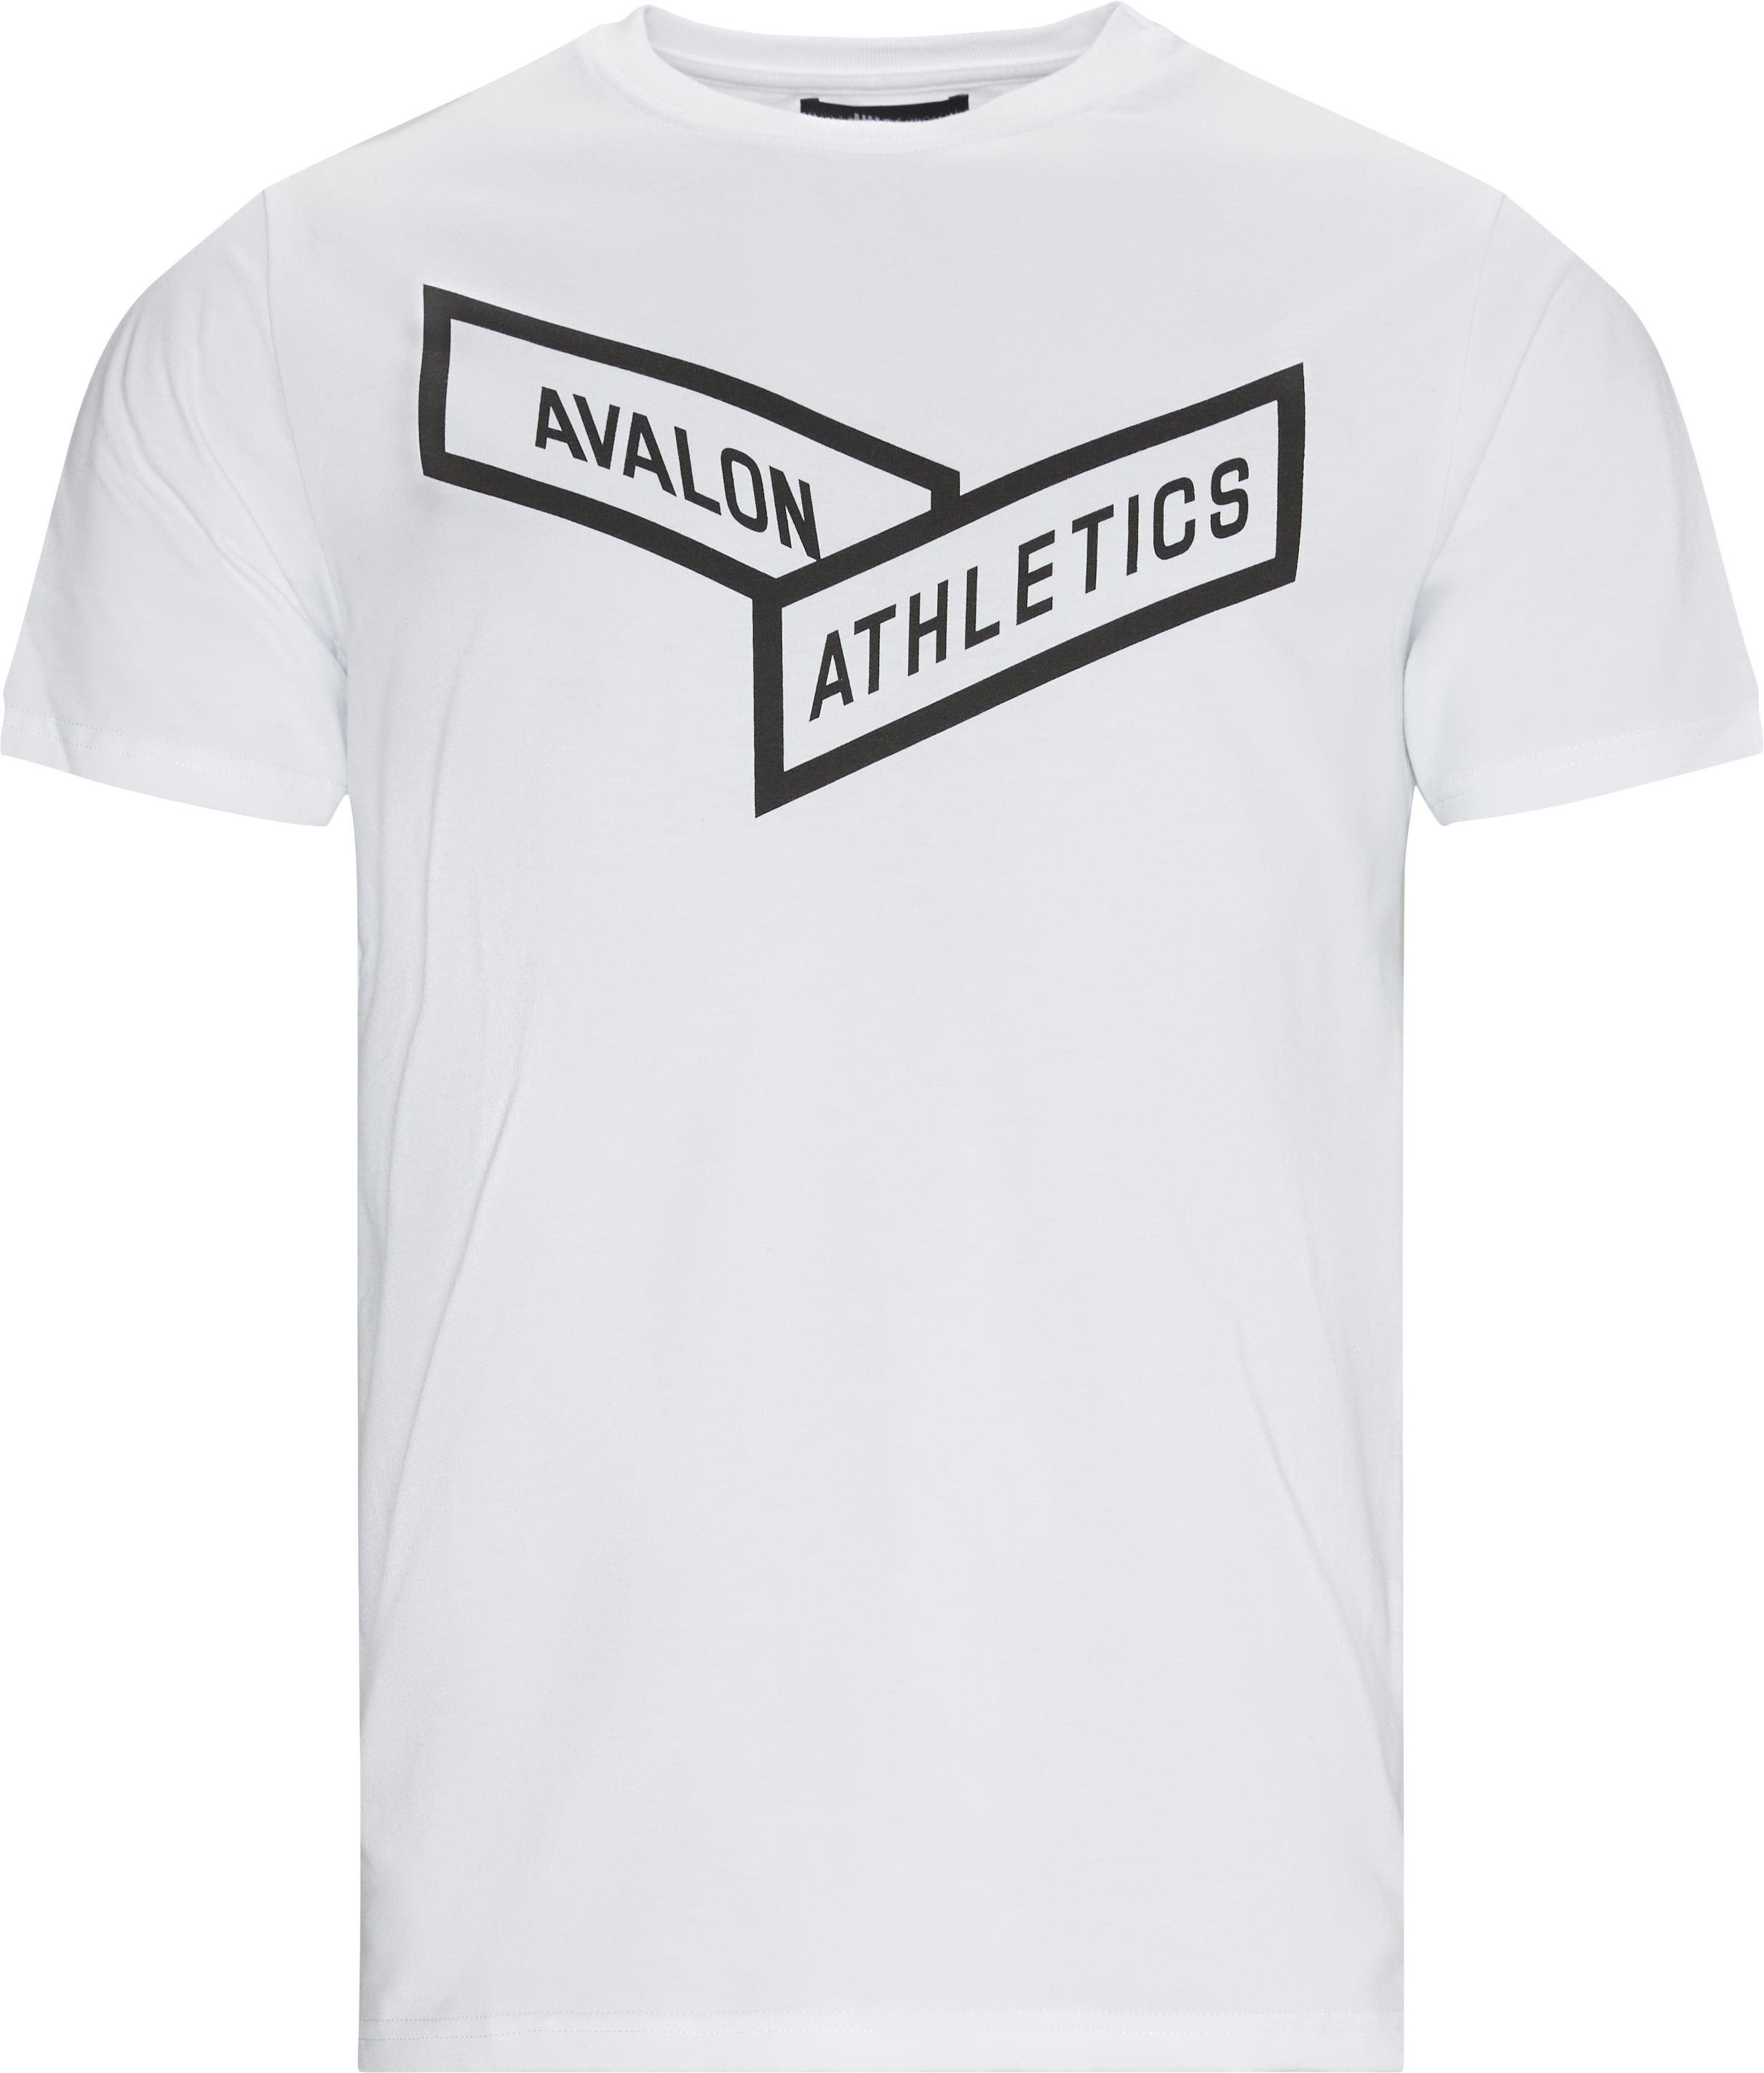 HURRICANE Logo T-shirt - T-shirts - Regular fit - Hvid